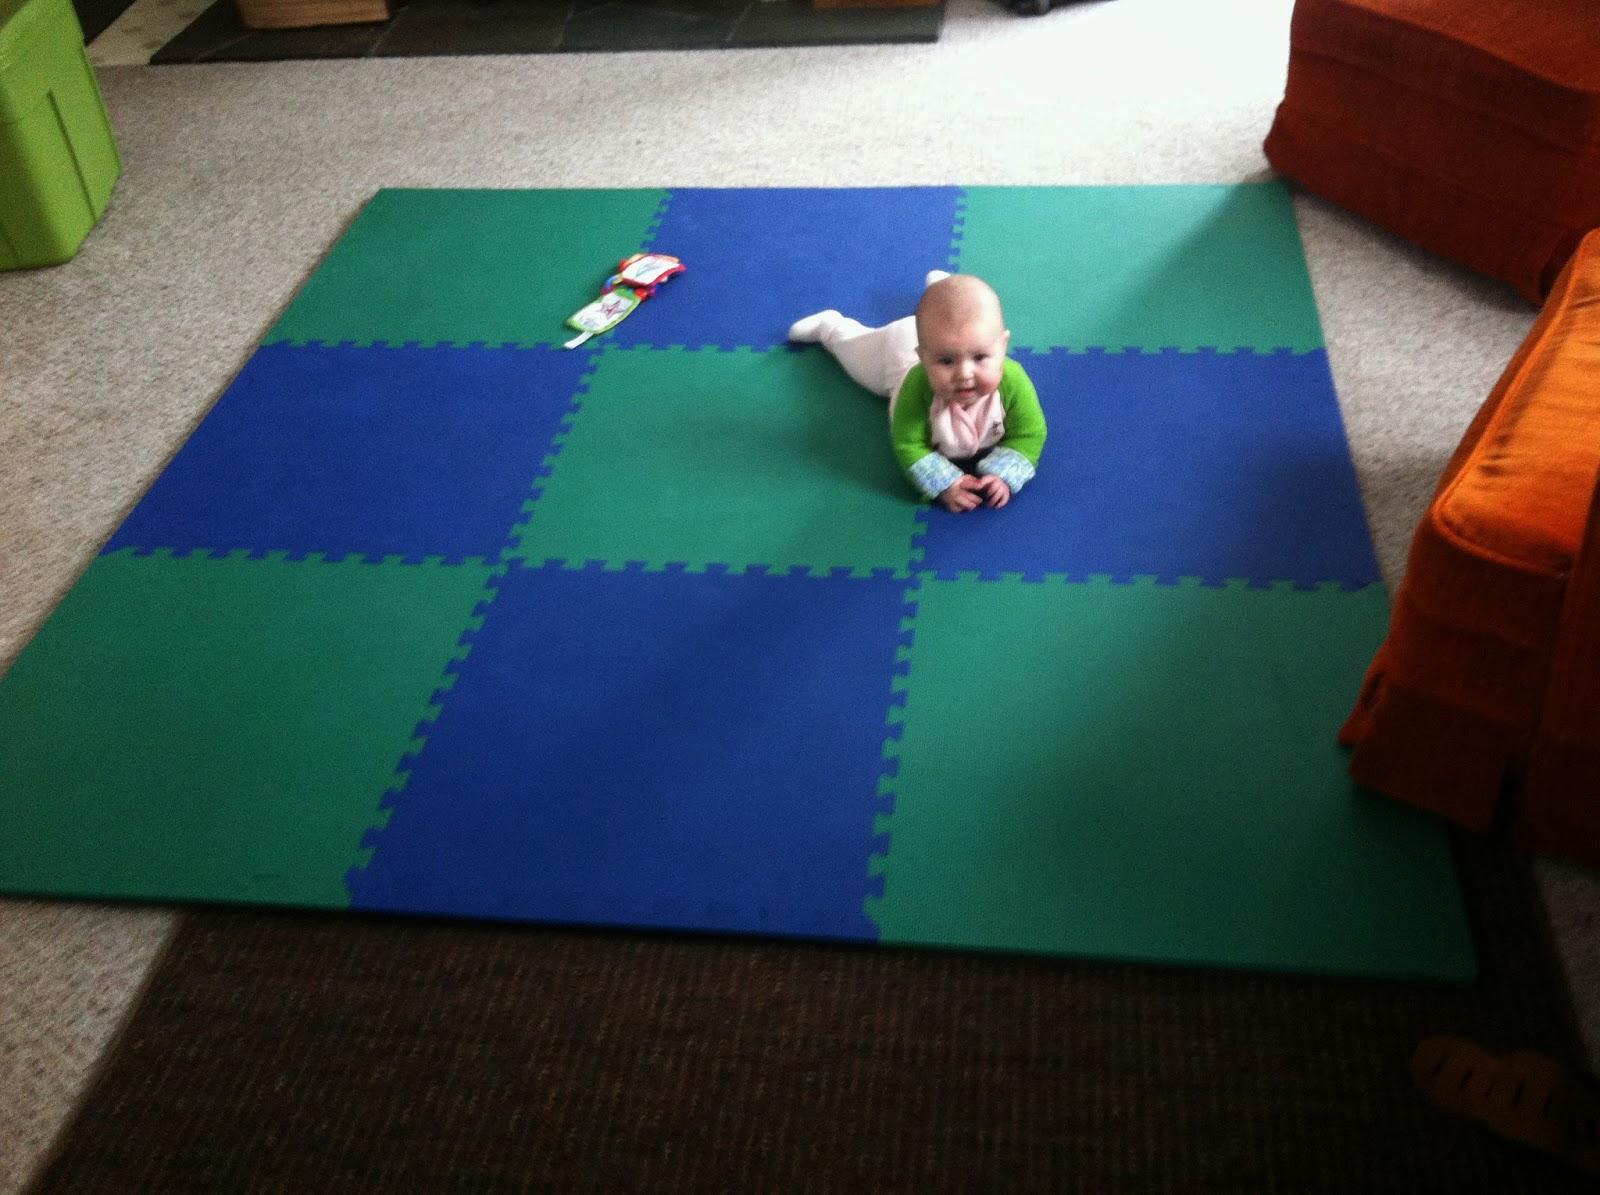 Greatmats specialty flooring mats and tiles customer for Floor kids review